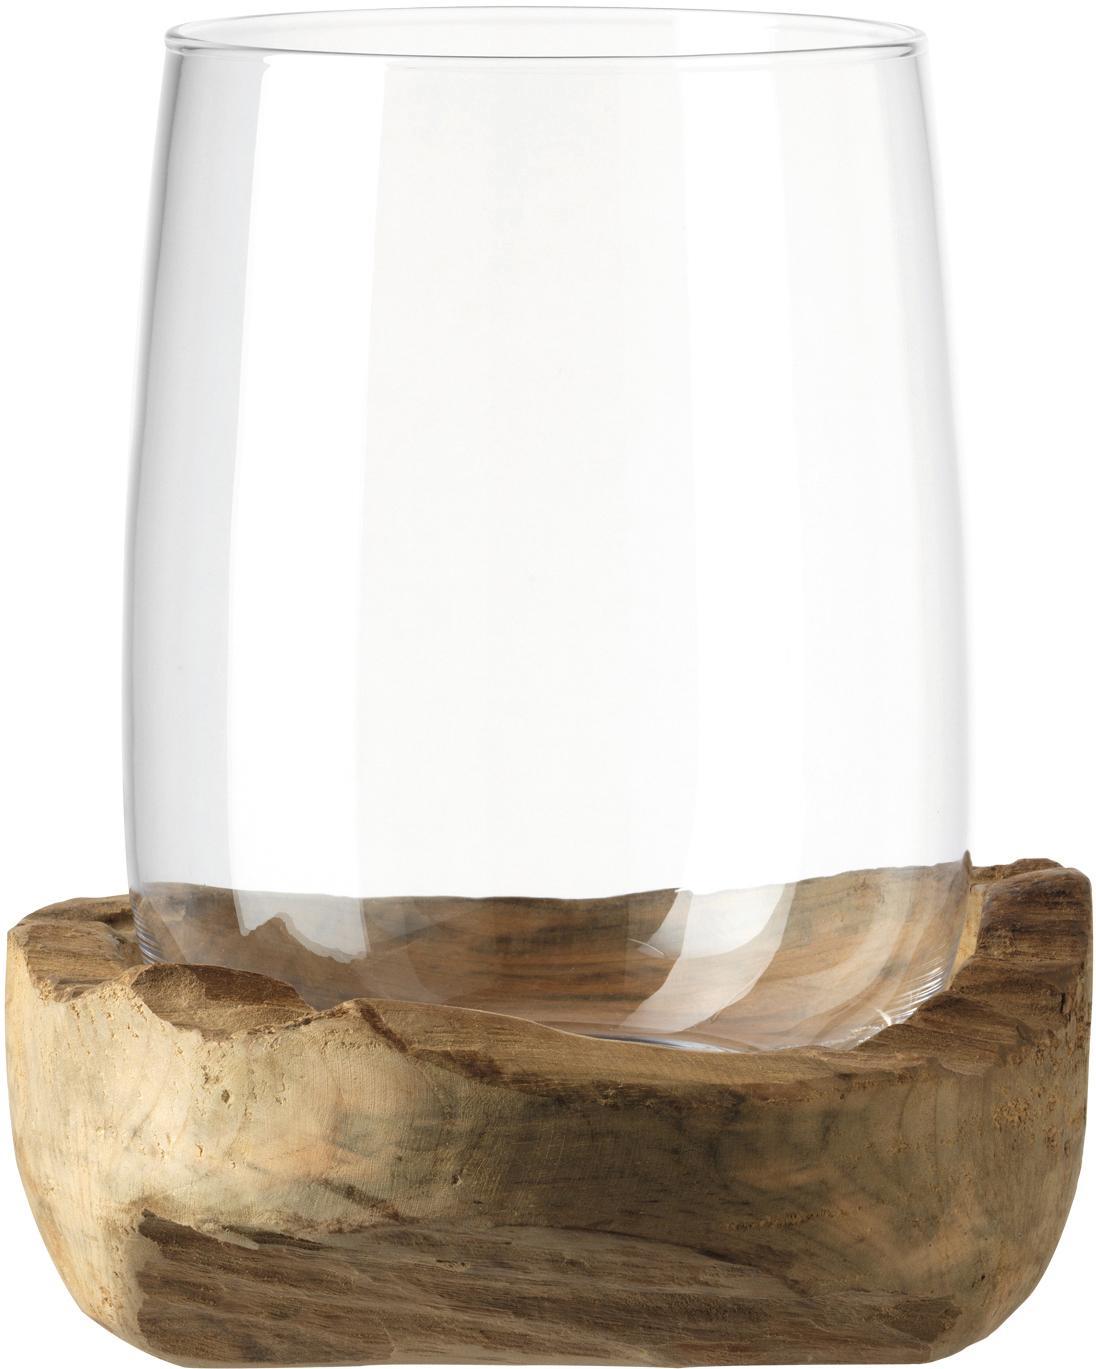 Portavelas artesanal Terra, Portavelas: vidrio, Transparente, Ø 23 x Al 27 cm